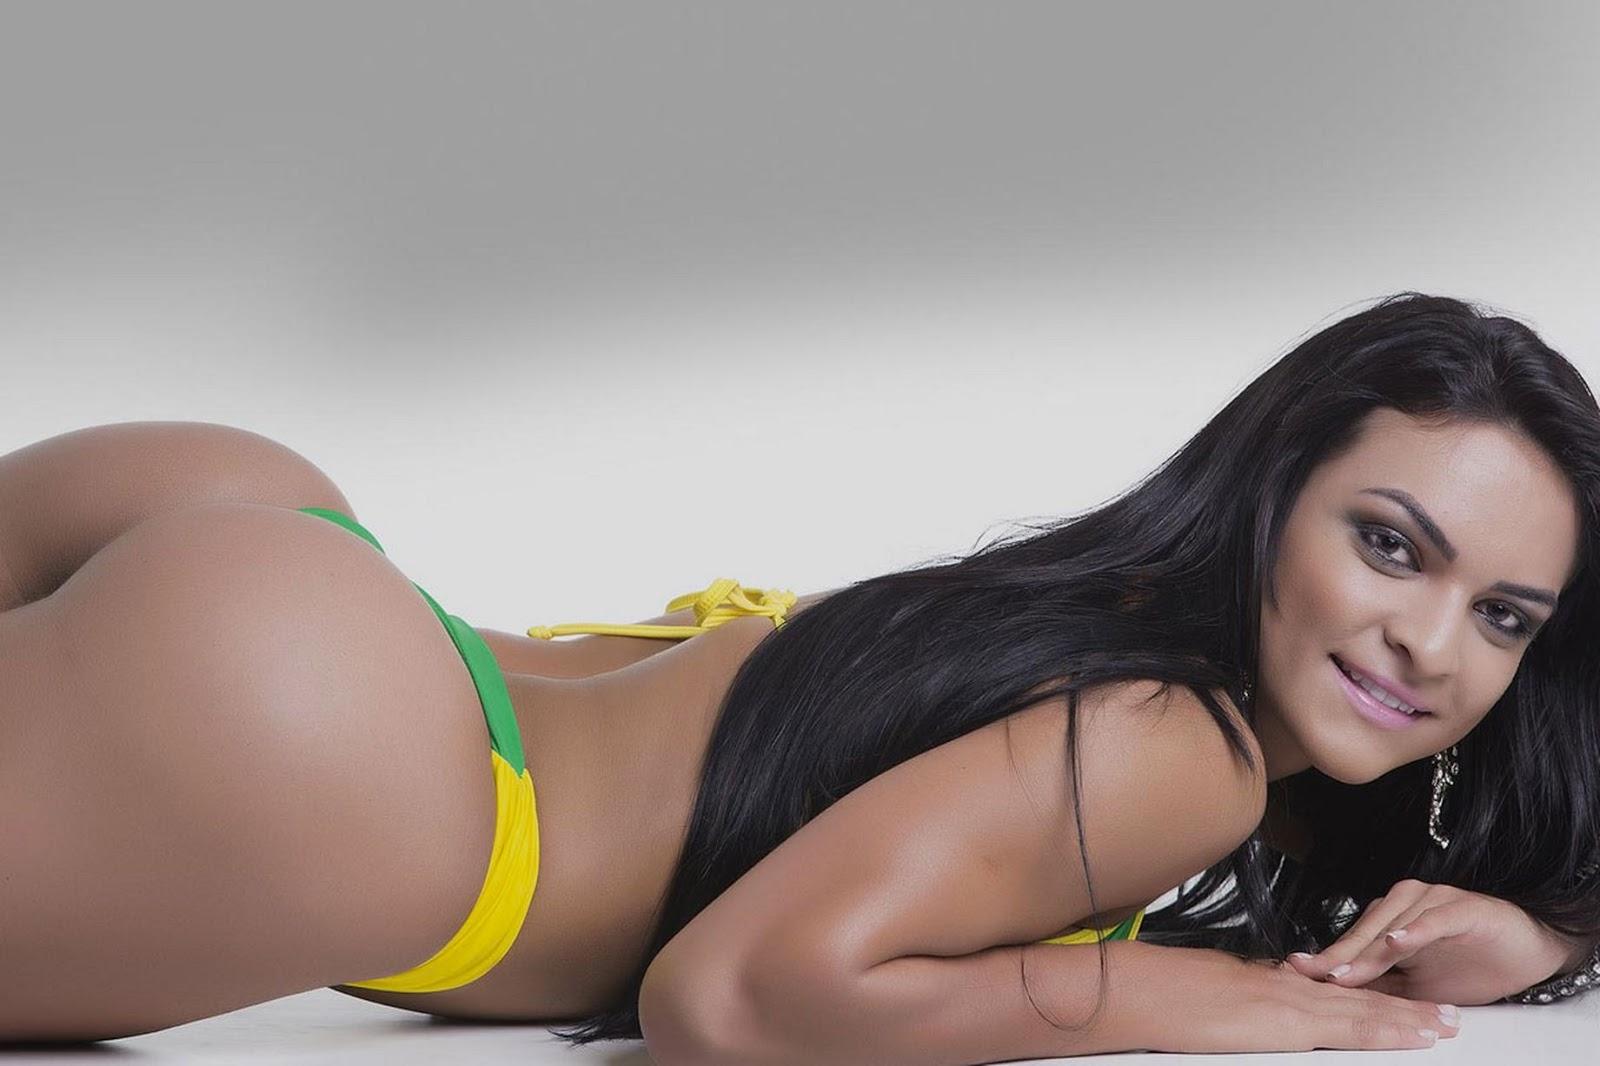 brazilian shemale backside